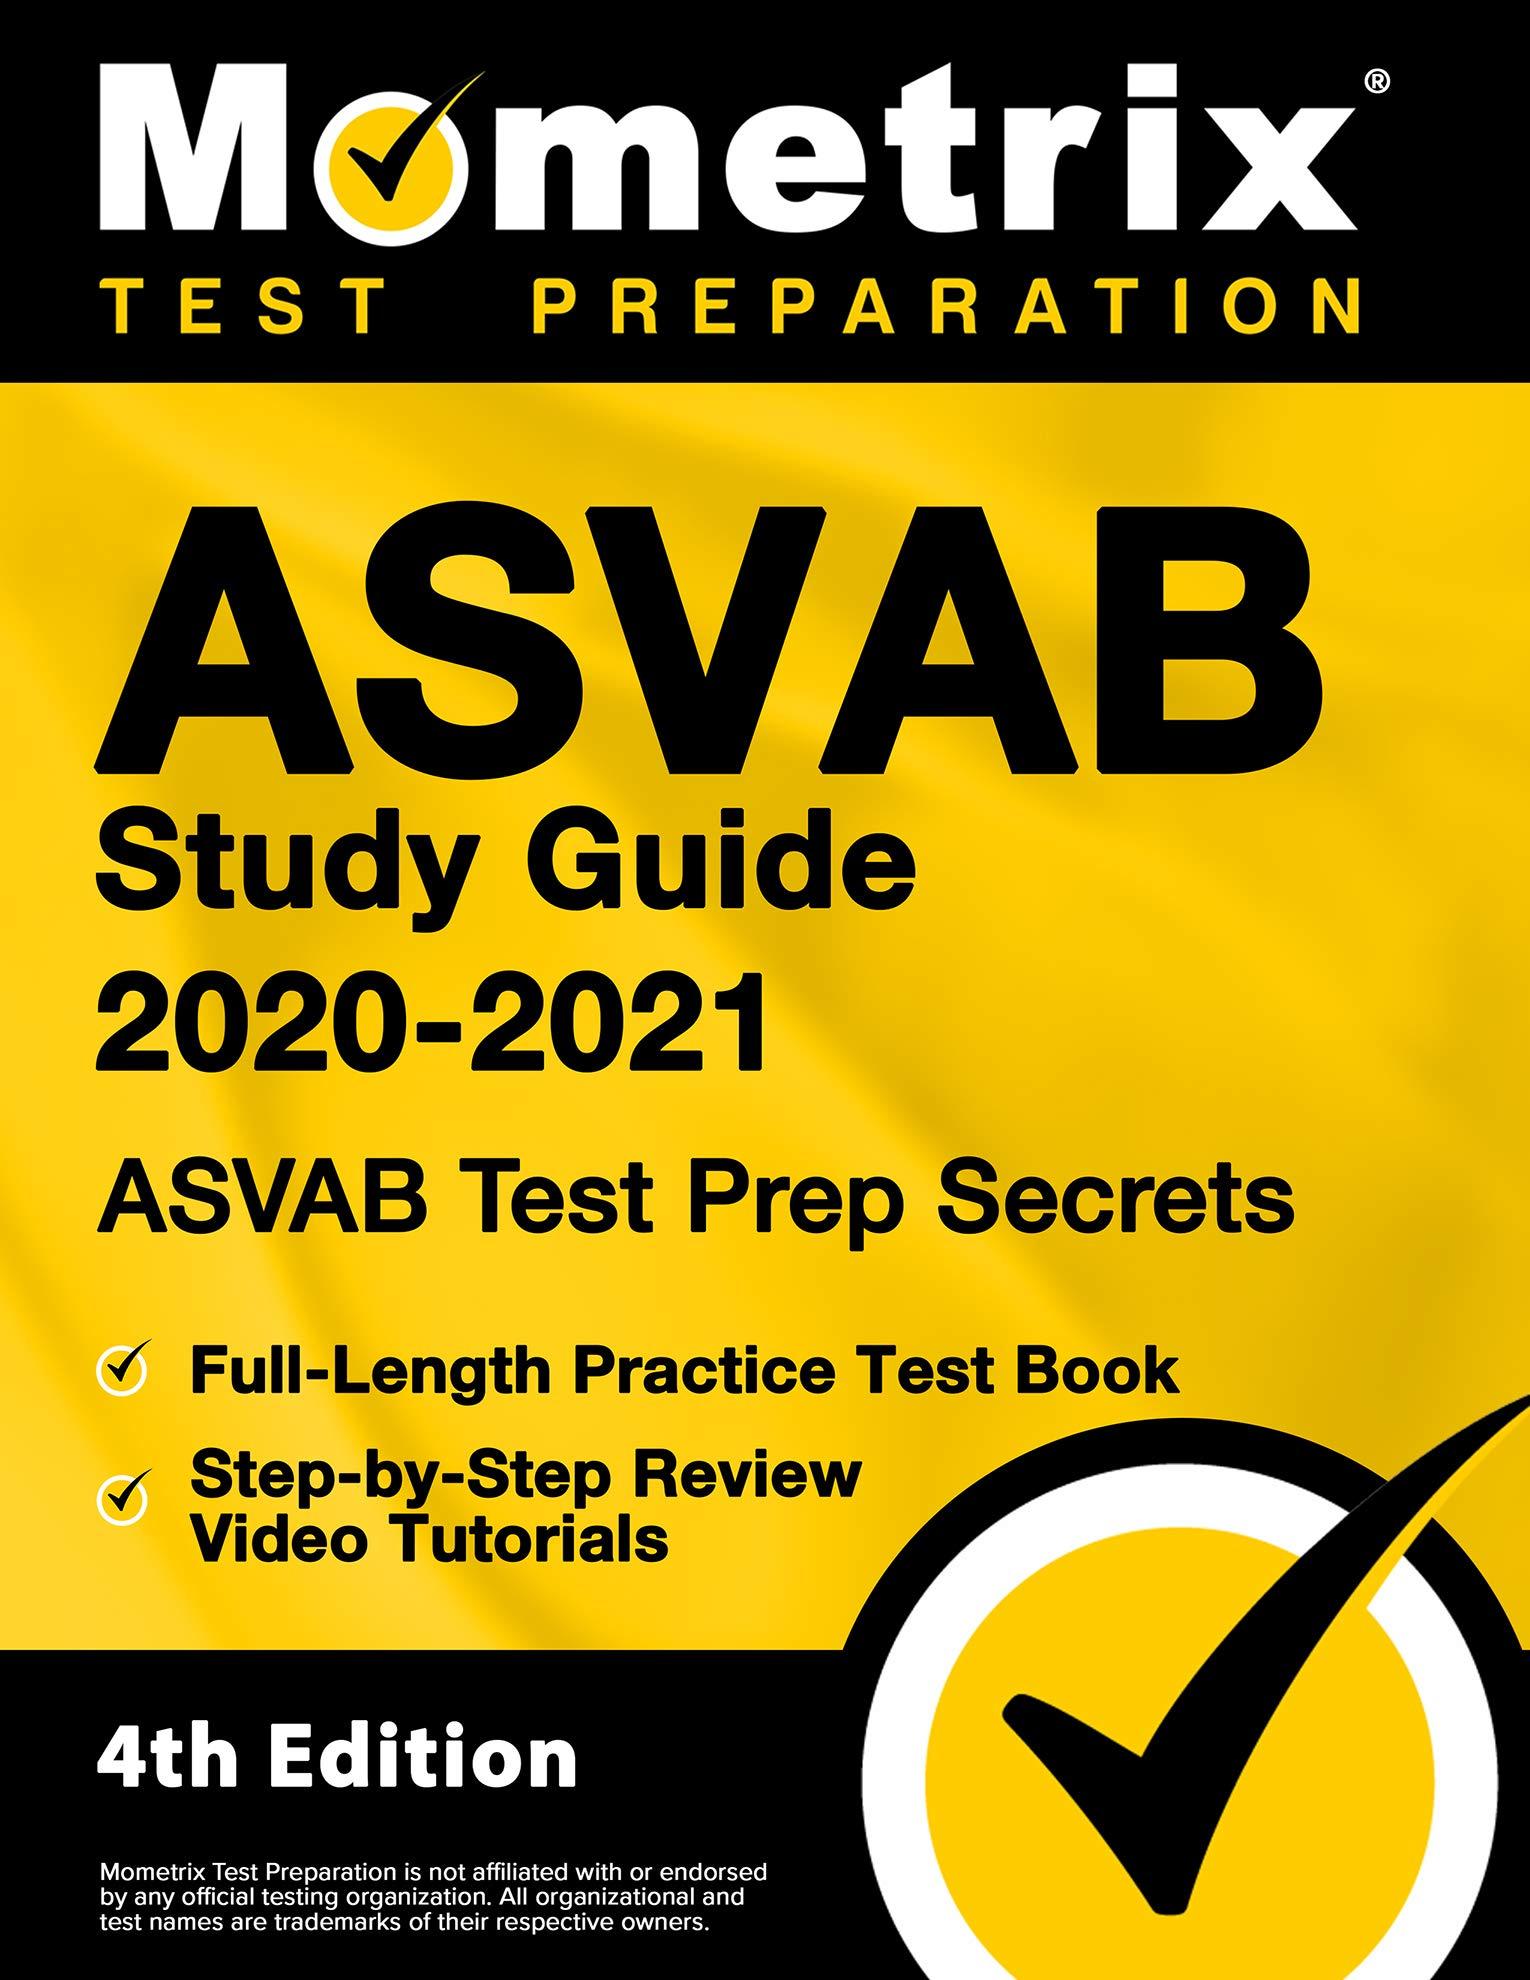 Asvab Study Guide 2020 2021 Asvab Test Prep Secrets Full Length Practice Test Book Step By Step Review Video Tutorials 4th Edition Mometrix Test Prep 9781516714964 Amazon Com Books